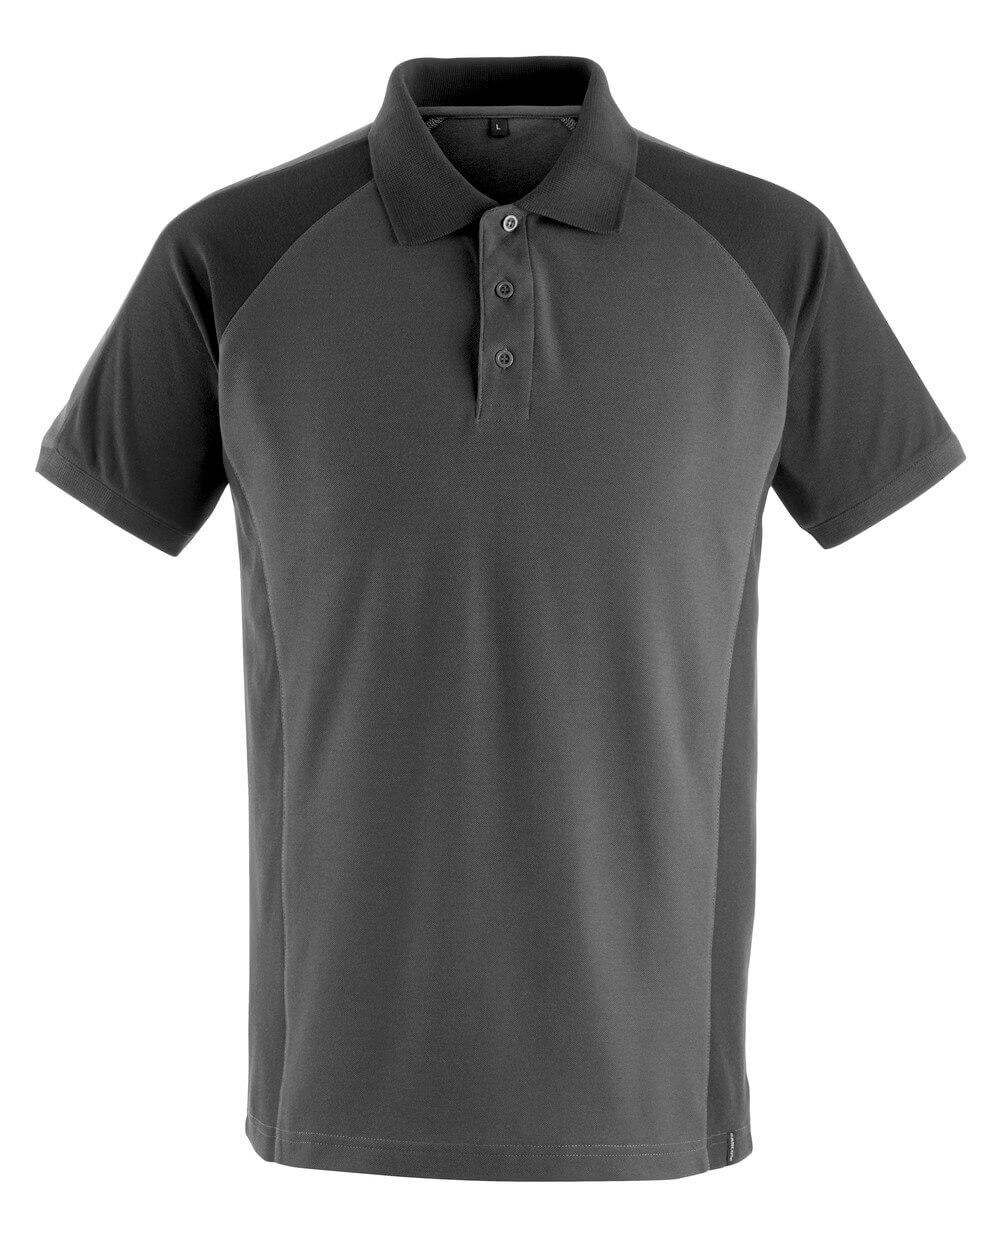 50569-961-1809 Polo shirt - dark anthracite/black